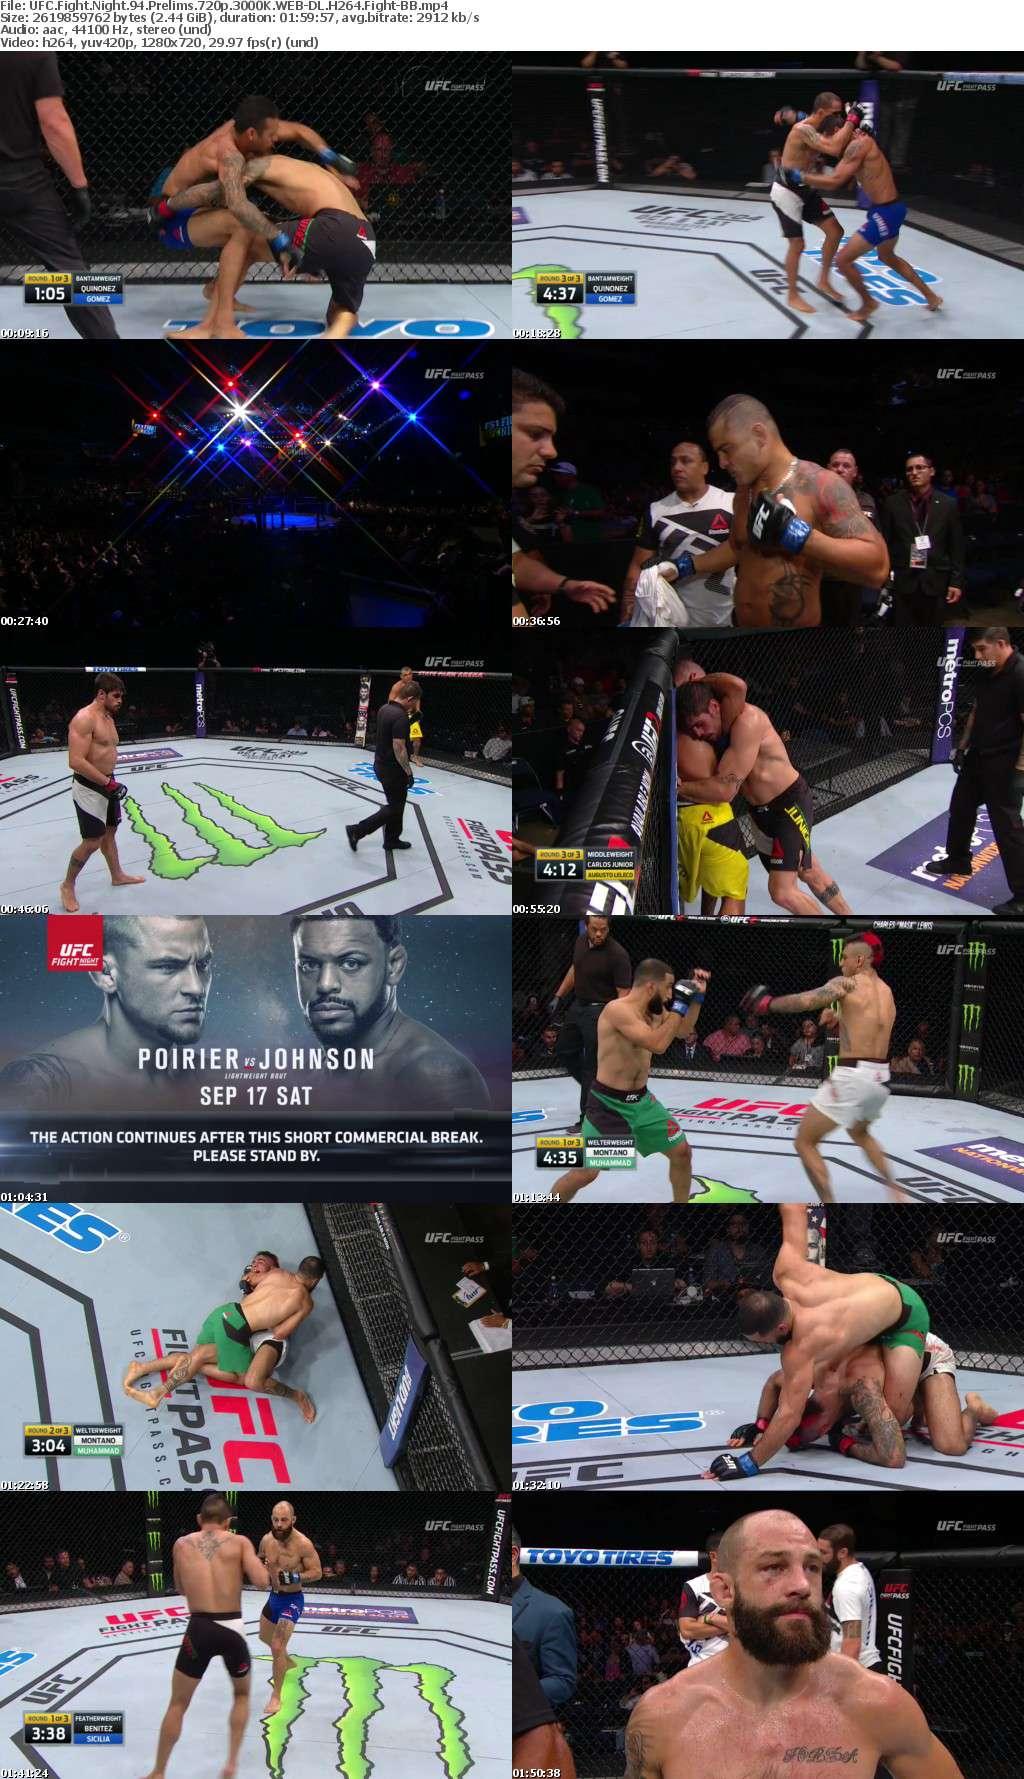 UFC Fight Night 94 Prelims 720p 3000K WEB-DL H264 Fight-BB